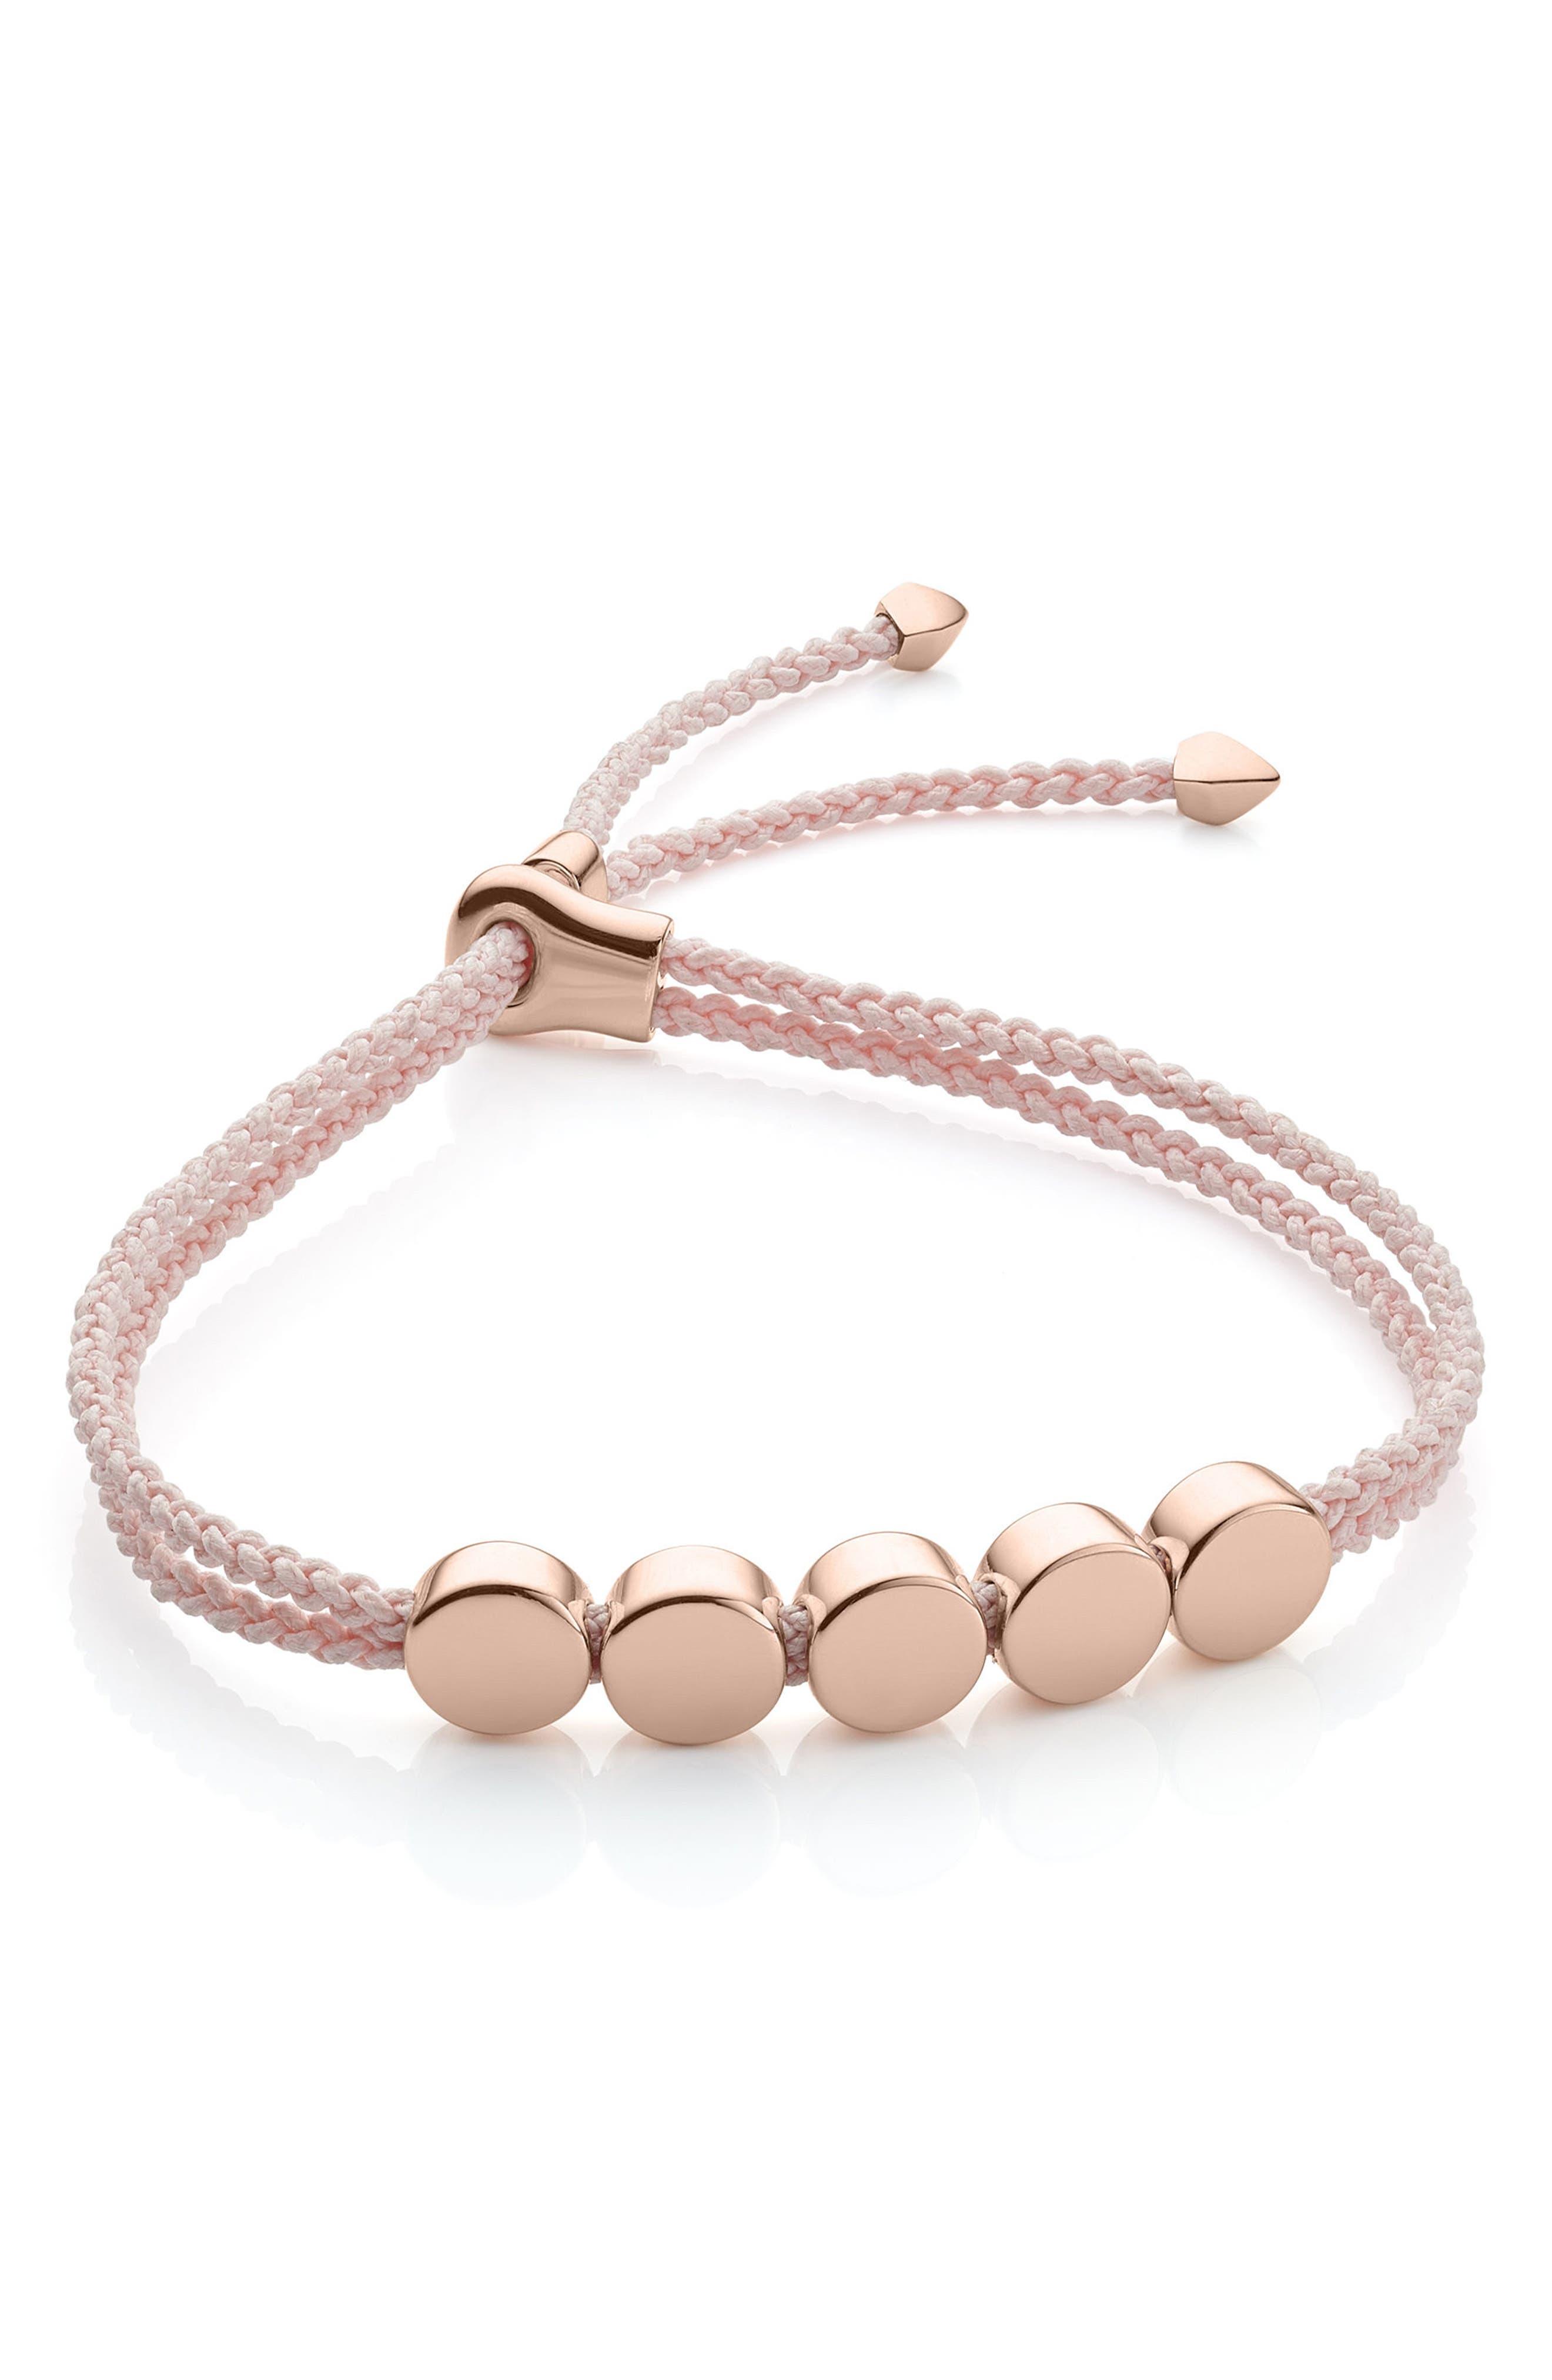 Monica Vinader Friendship Bracelet